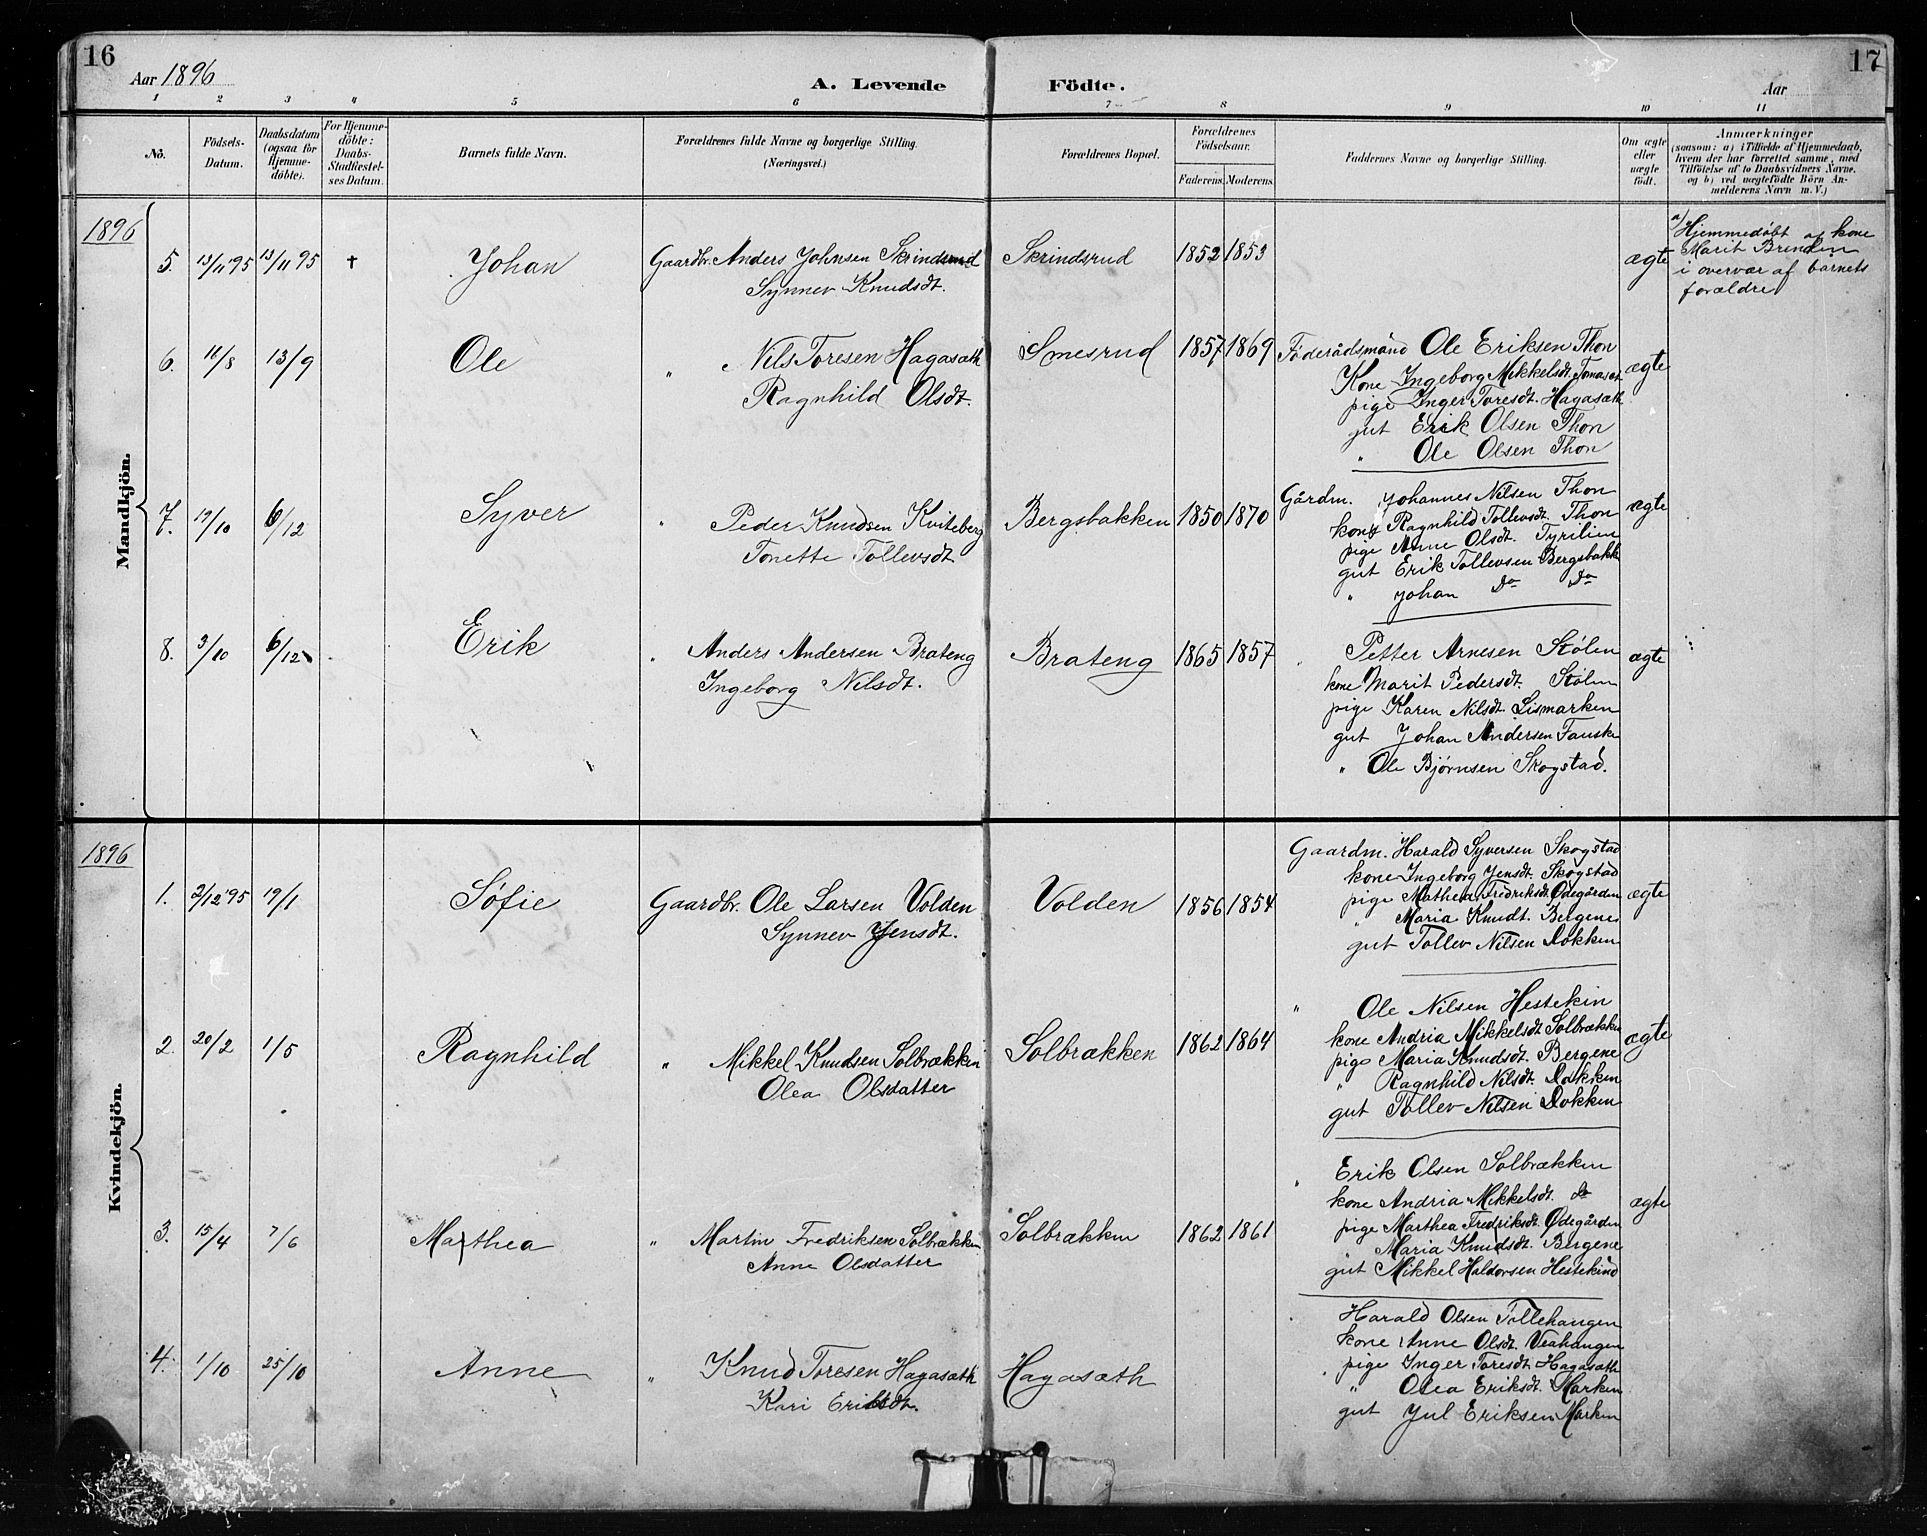 SAH, Etnedal prestekontor, H/Ha/Hab/Habb/L0001: Klokkerbok nr. II 1, 1894-1911, s. 16-17